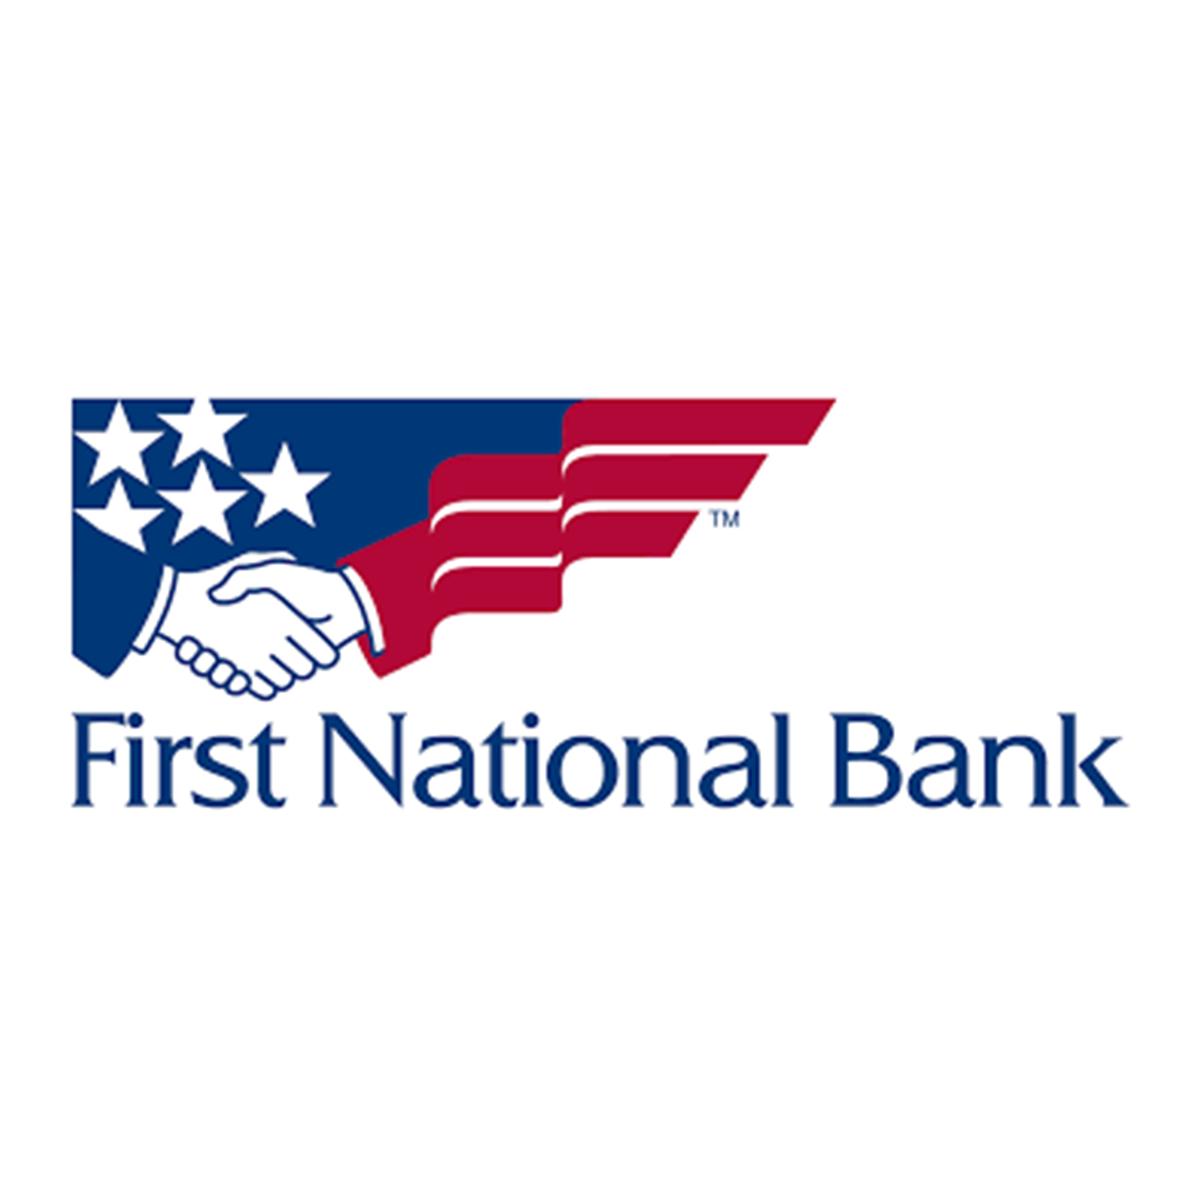 Web_First National Bank.jpg